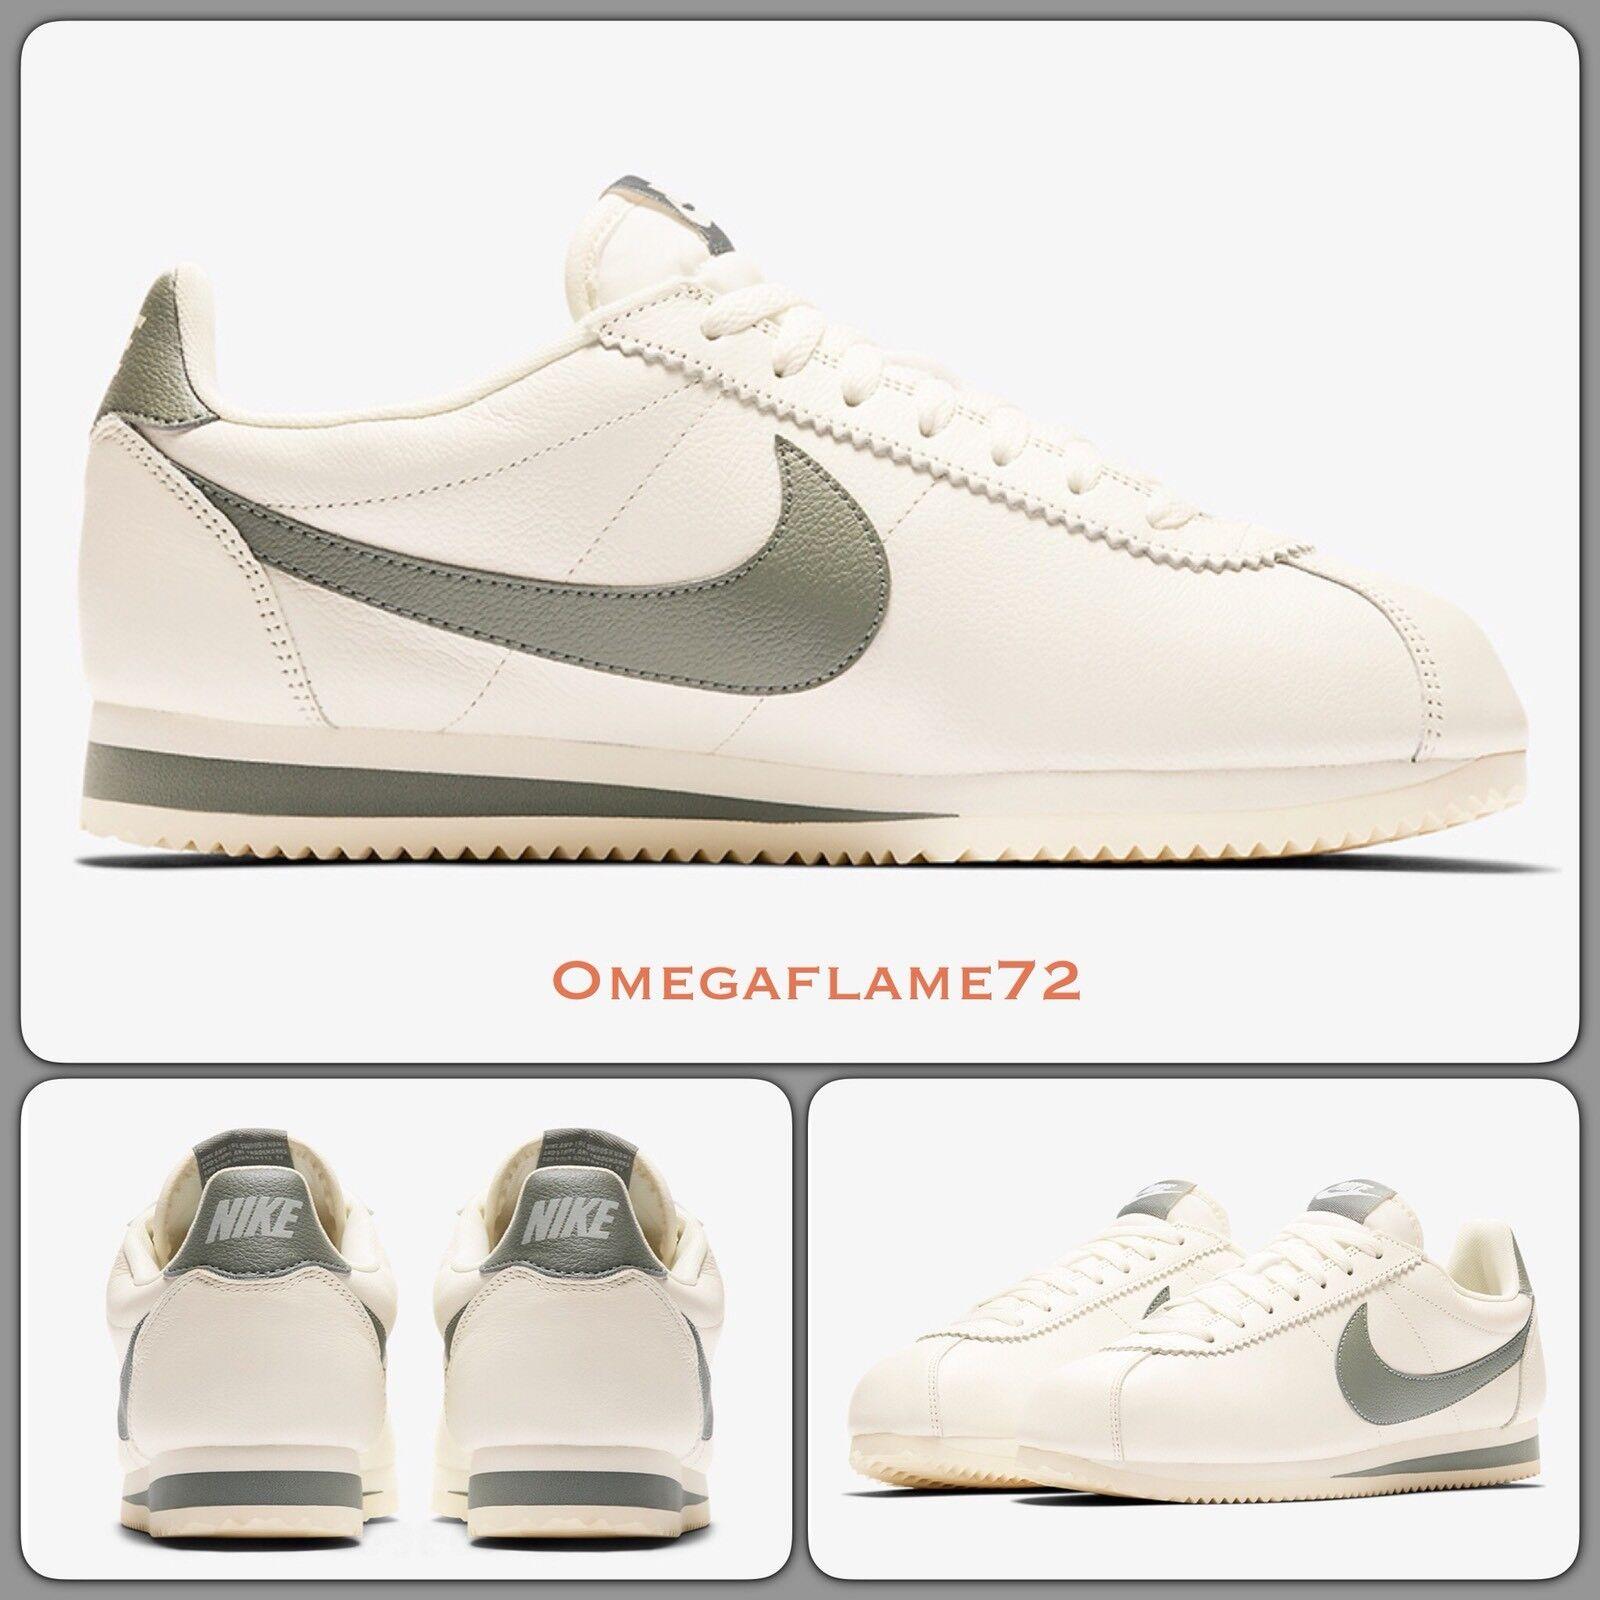 Nike Classic Cortez Leather SE, 861535-105, UK 9, EU 44, US 10, Sail-Dark Stucco